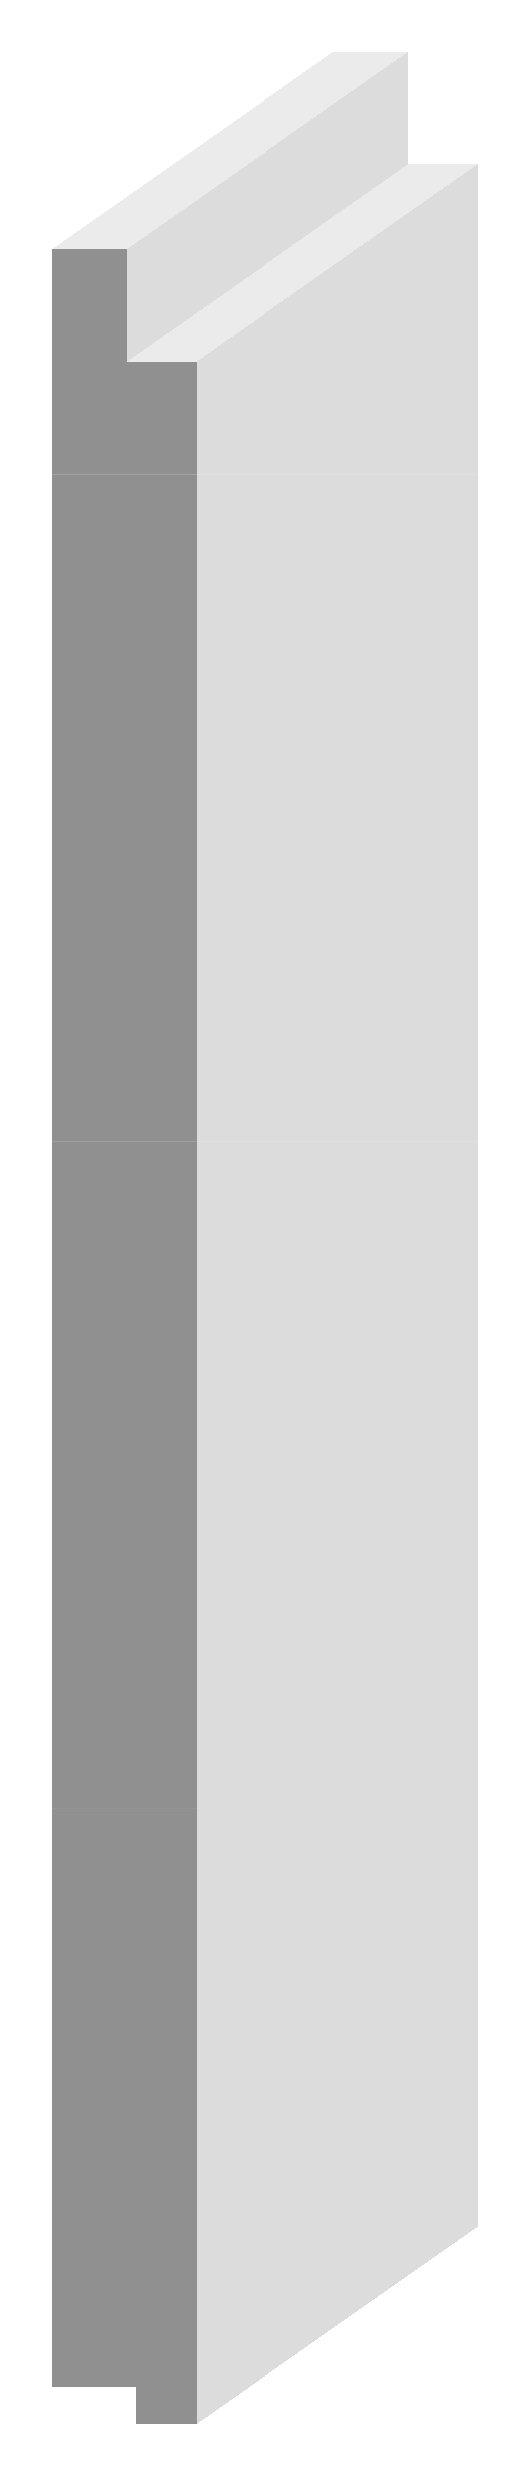 H889B